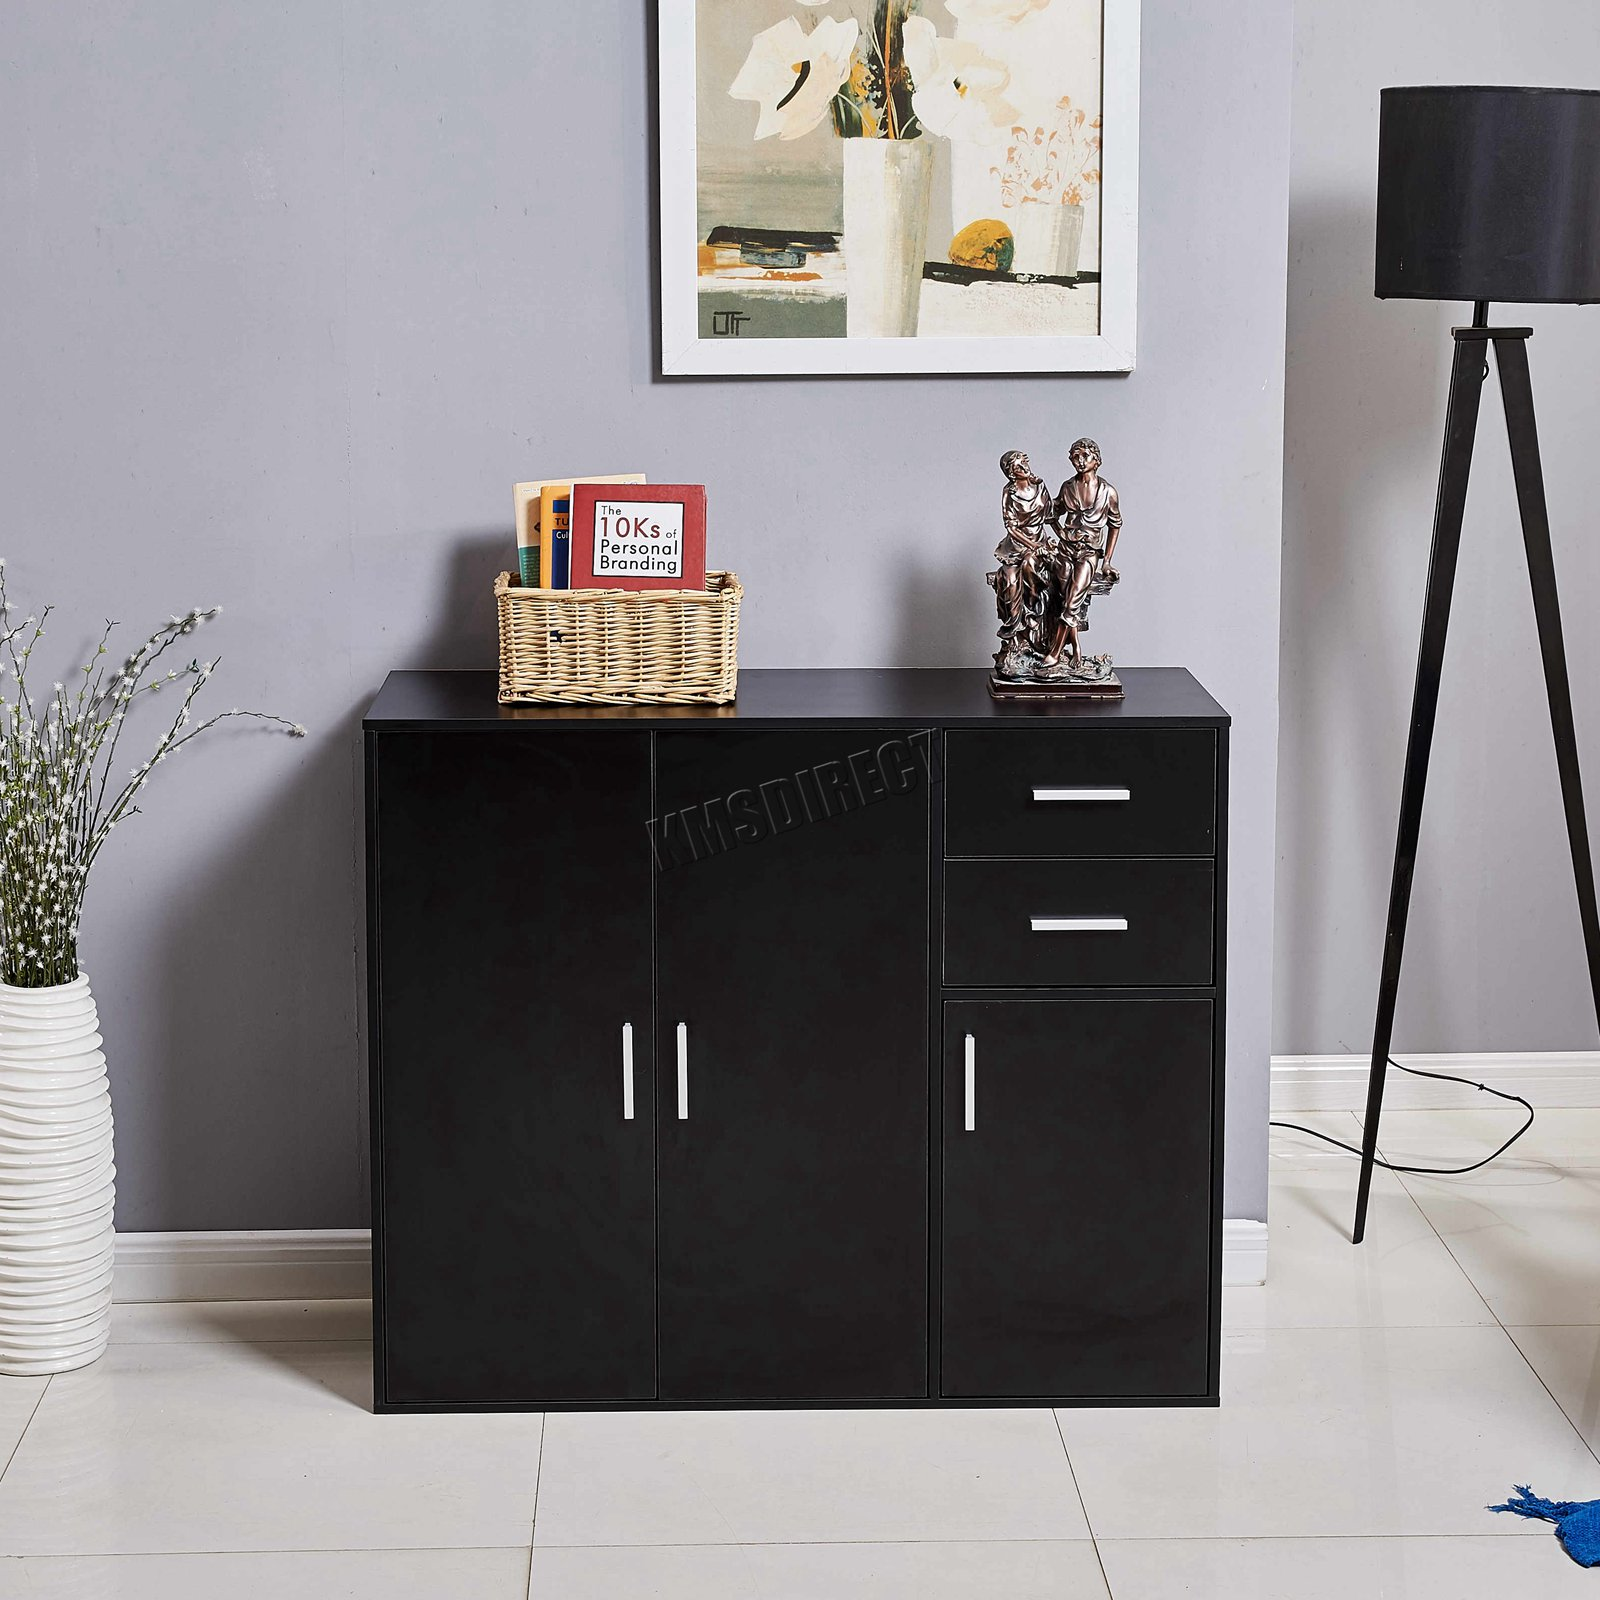 WestWood-Sideboard-Cabinet-Storage-tableware-Kitchen-Cupboard-Unit-PB-SSP01-NEW thumbnail 25